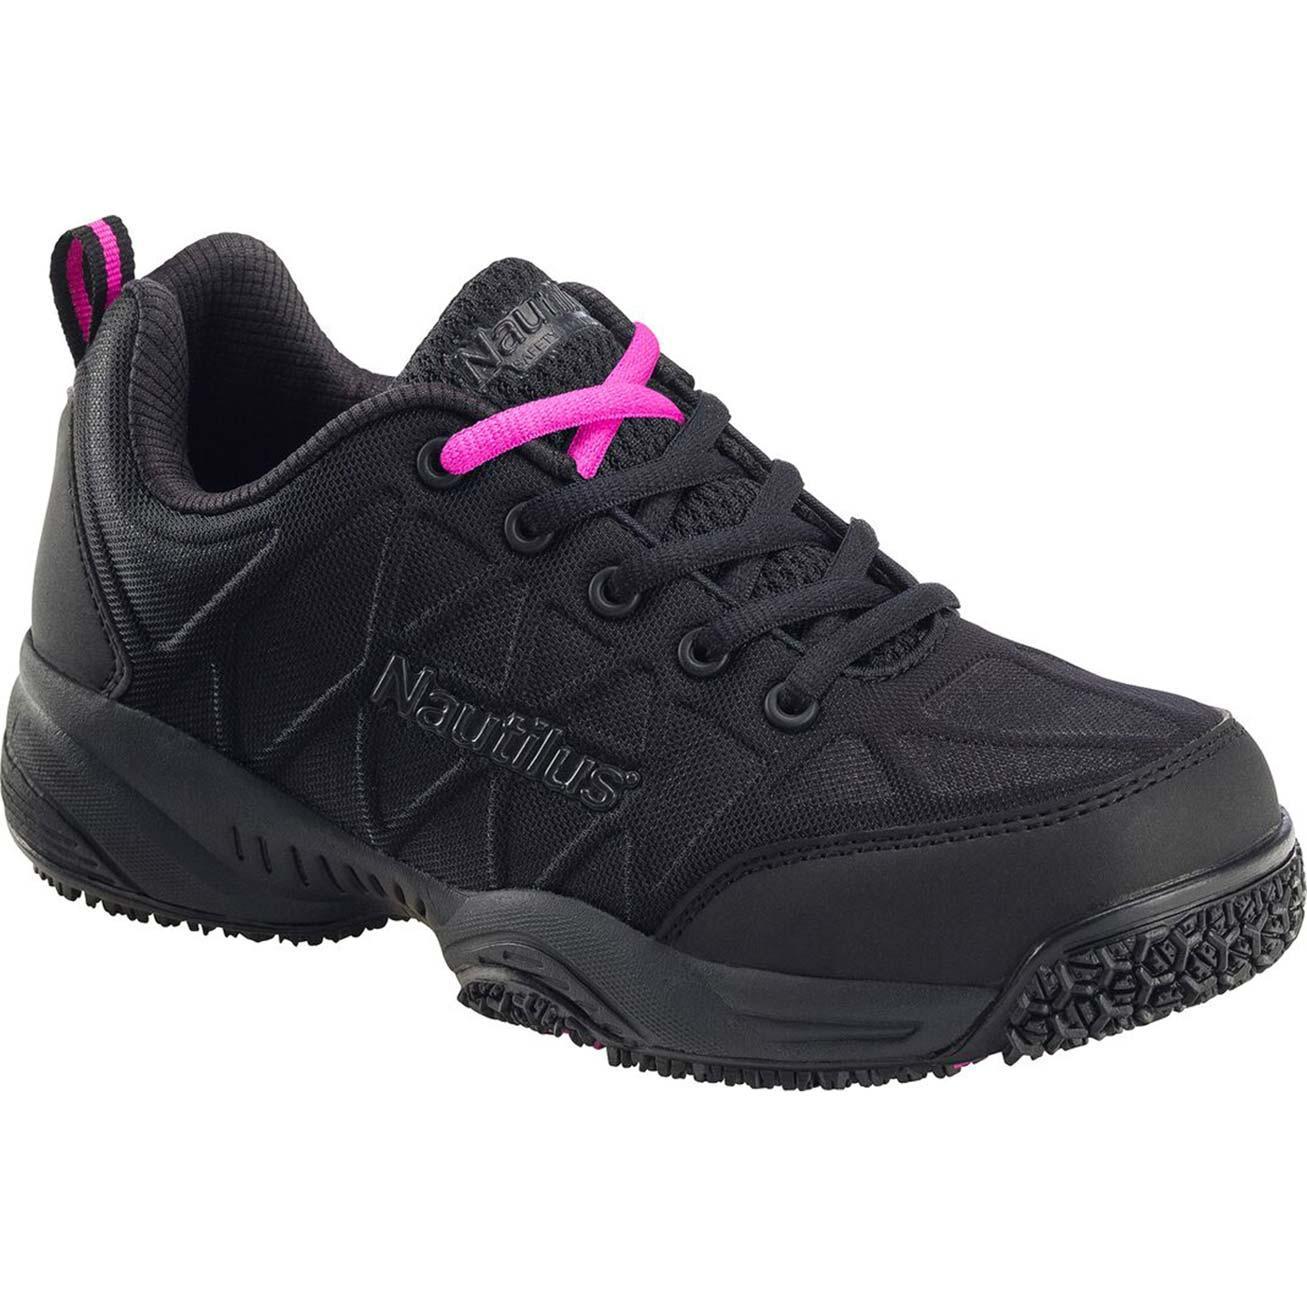 Composite Toe Work Athletic Shoe, N2158